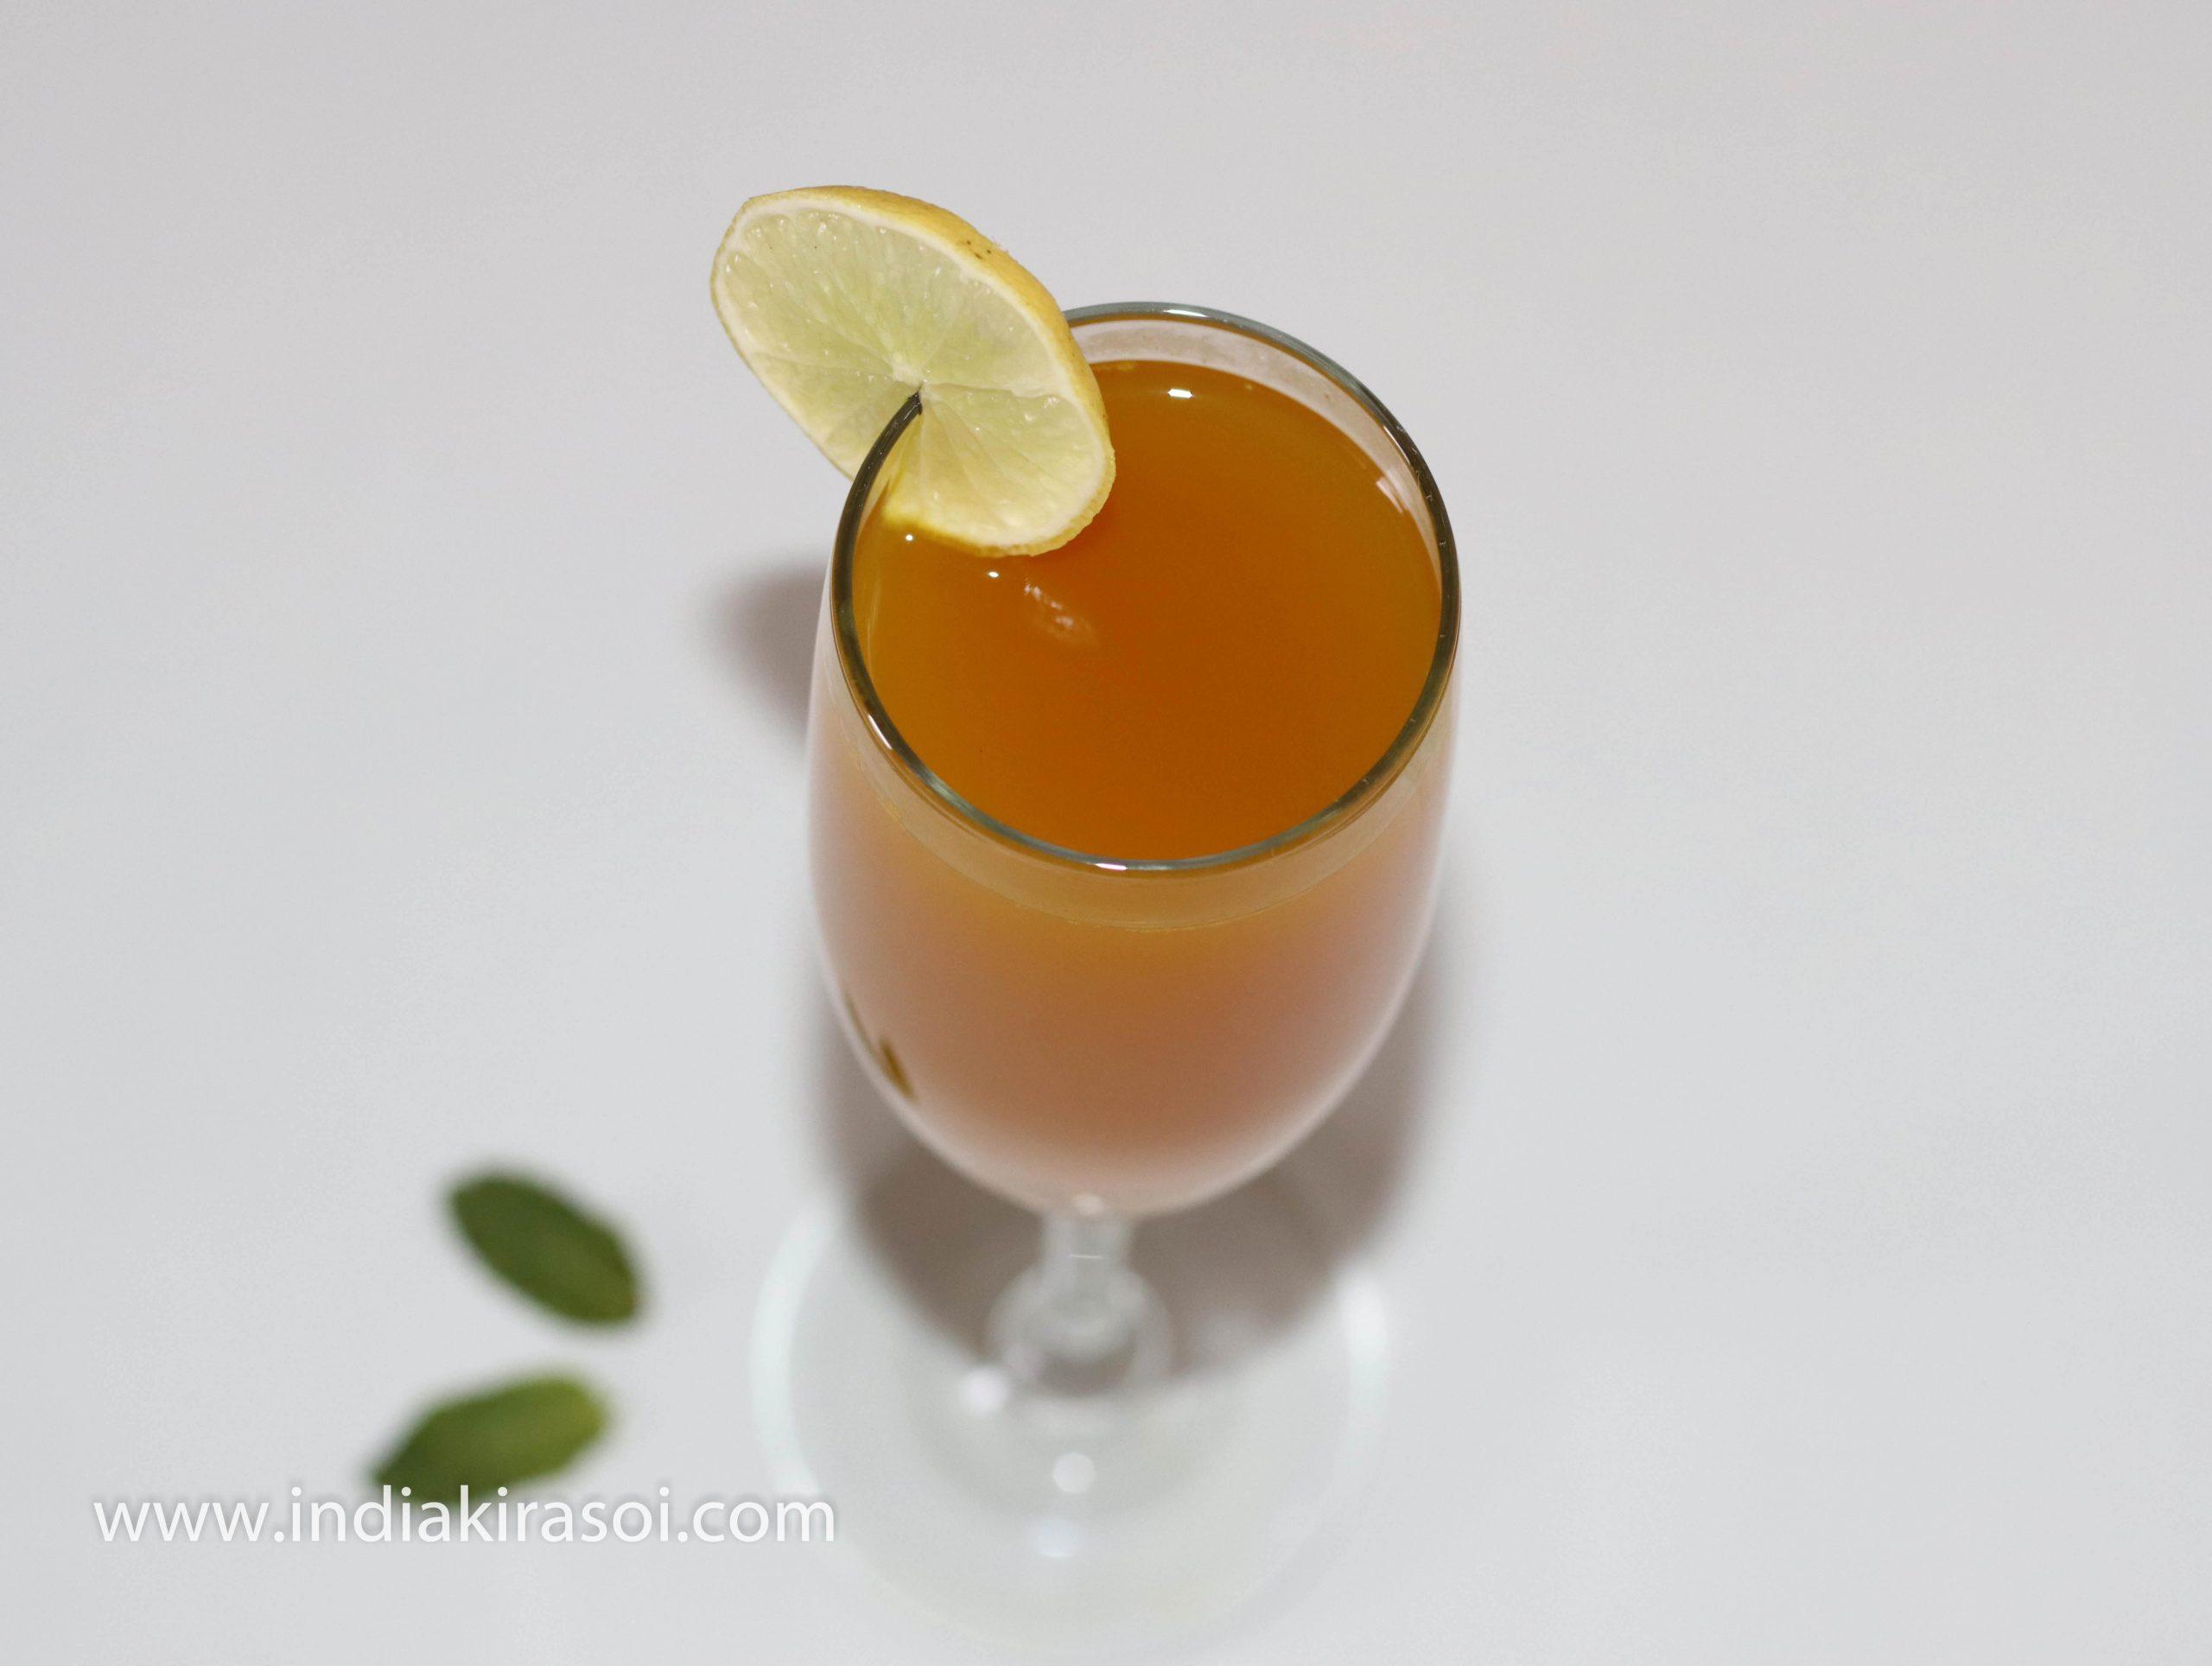 Turmeric ginger cumin water/ Haldi adrak jeera pani is ready.